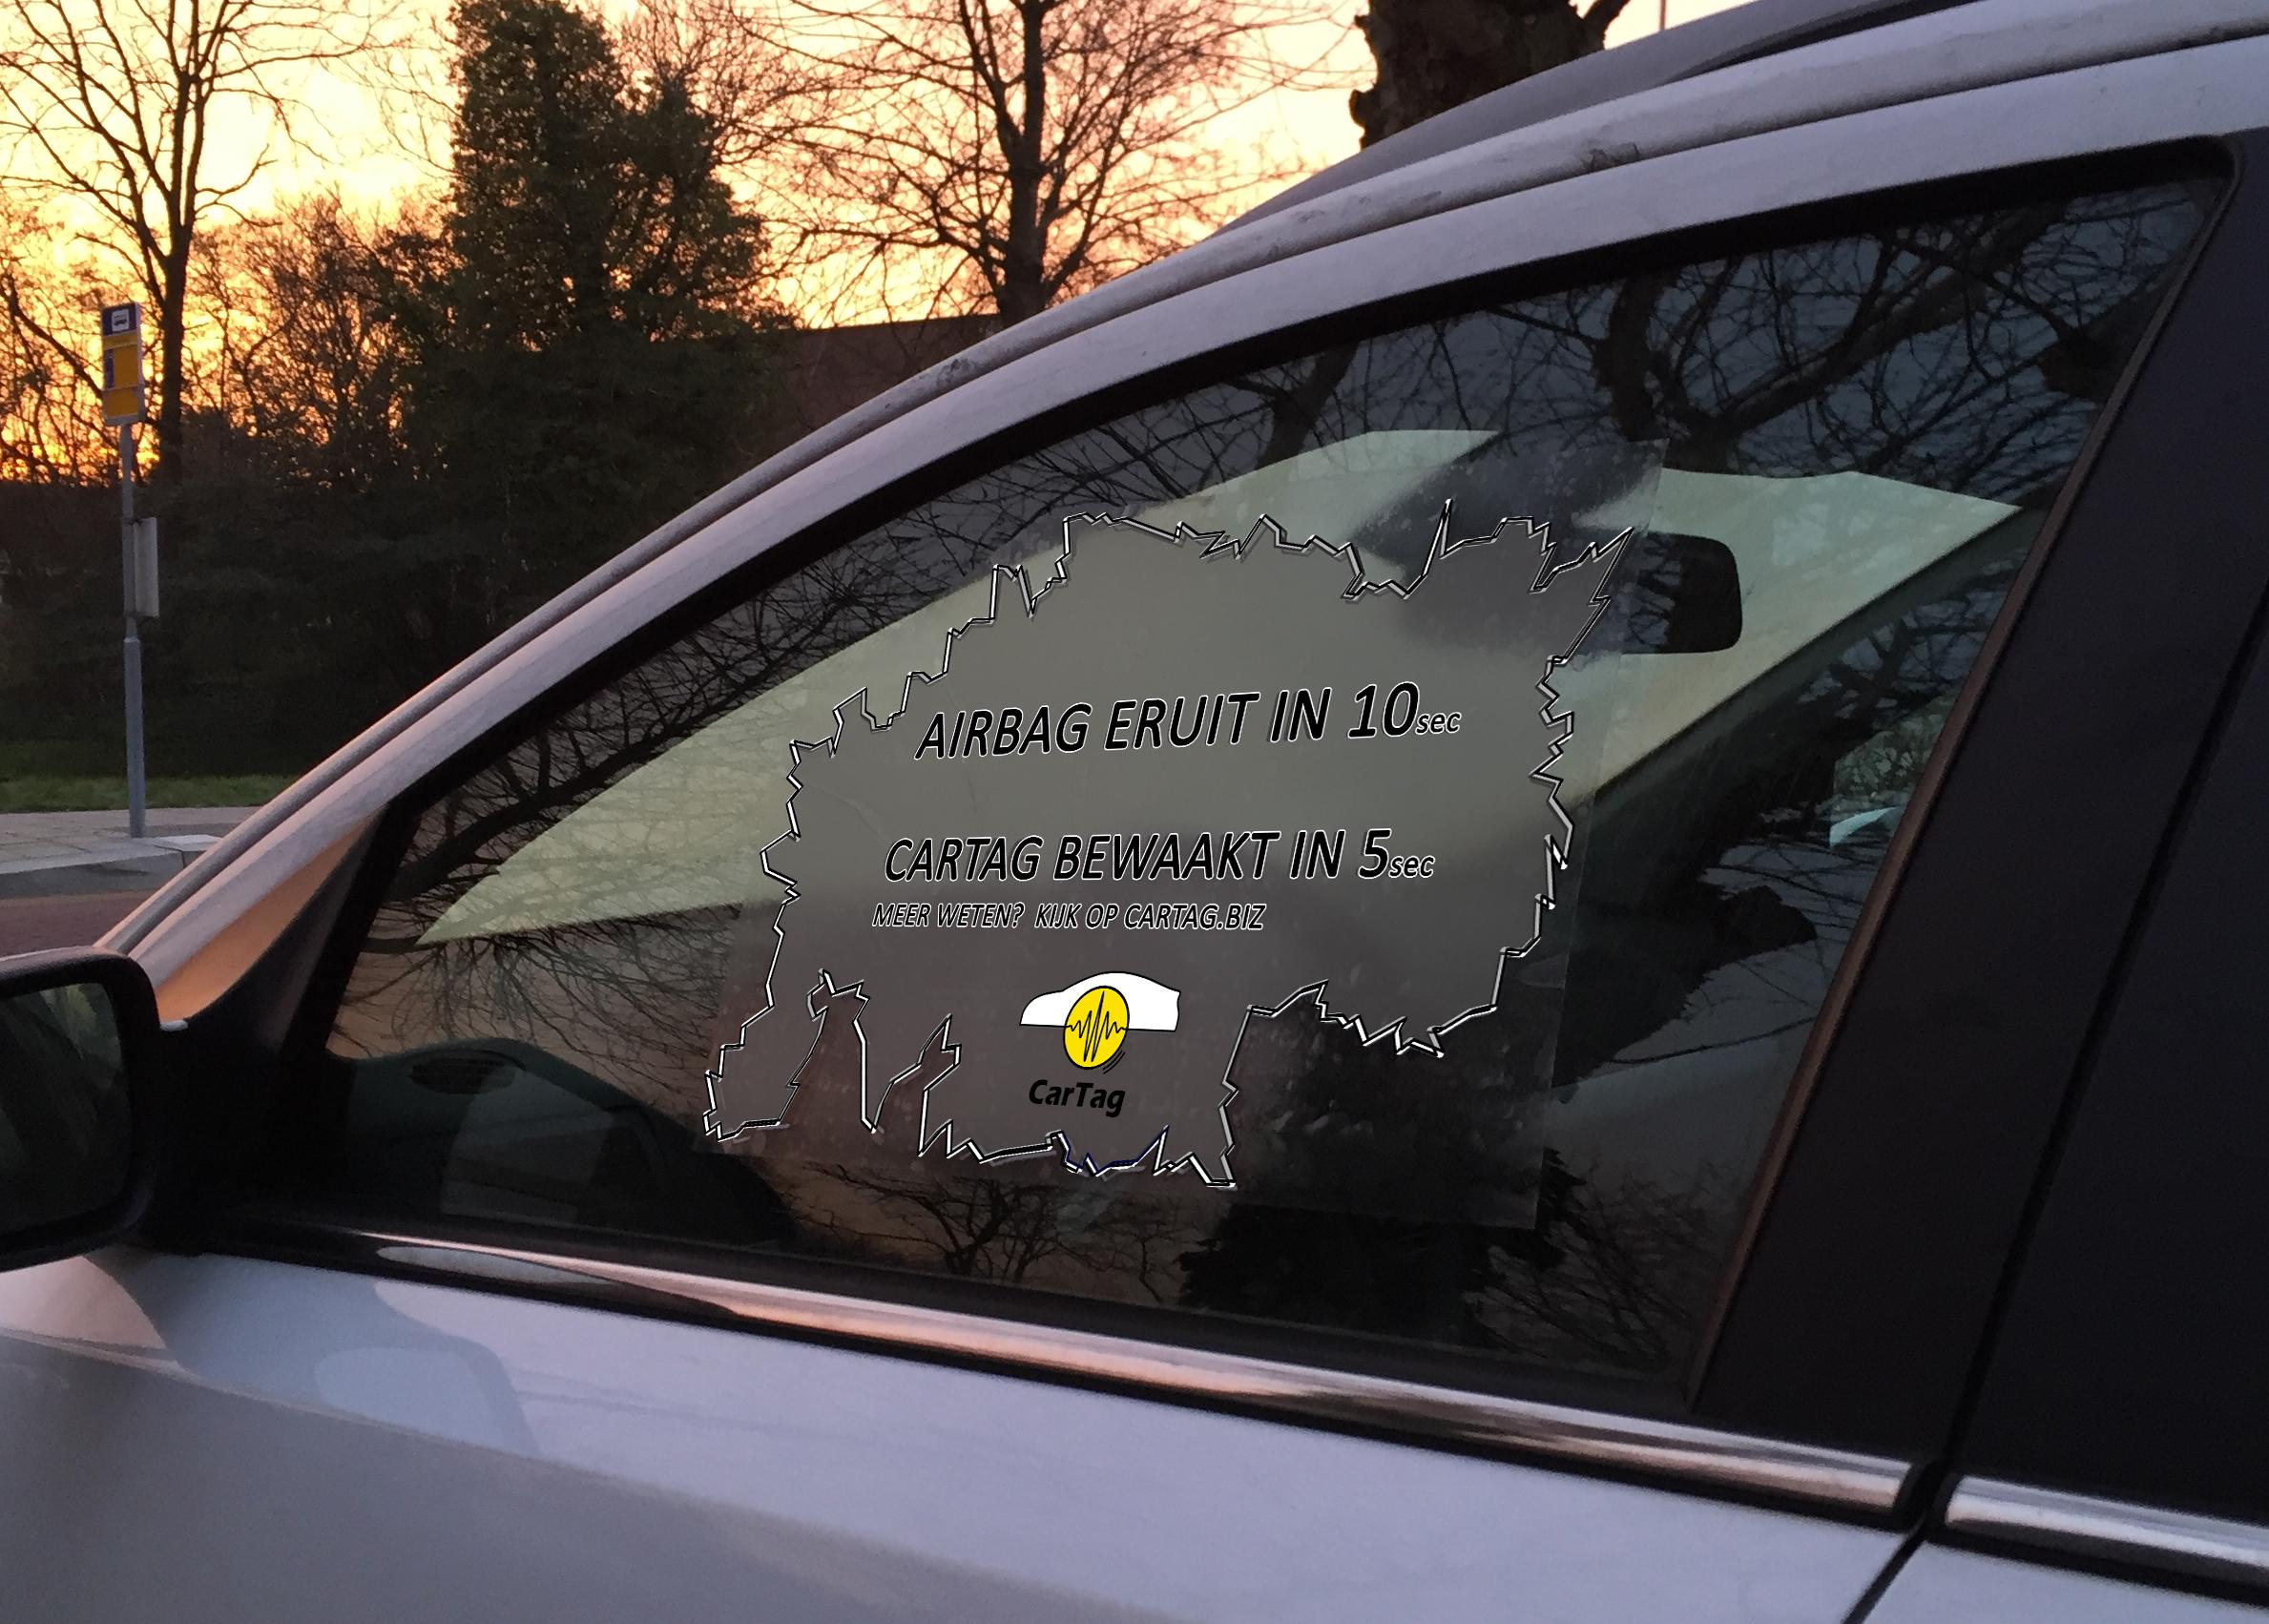 Airbag eruit in 10 (sec),  CarTag bewaakt in 5(sec)